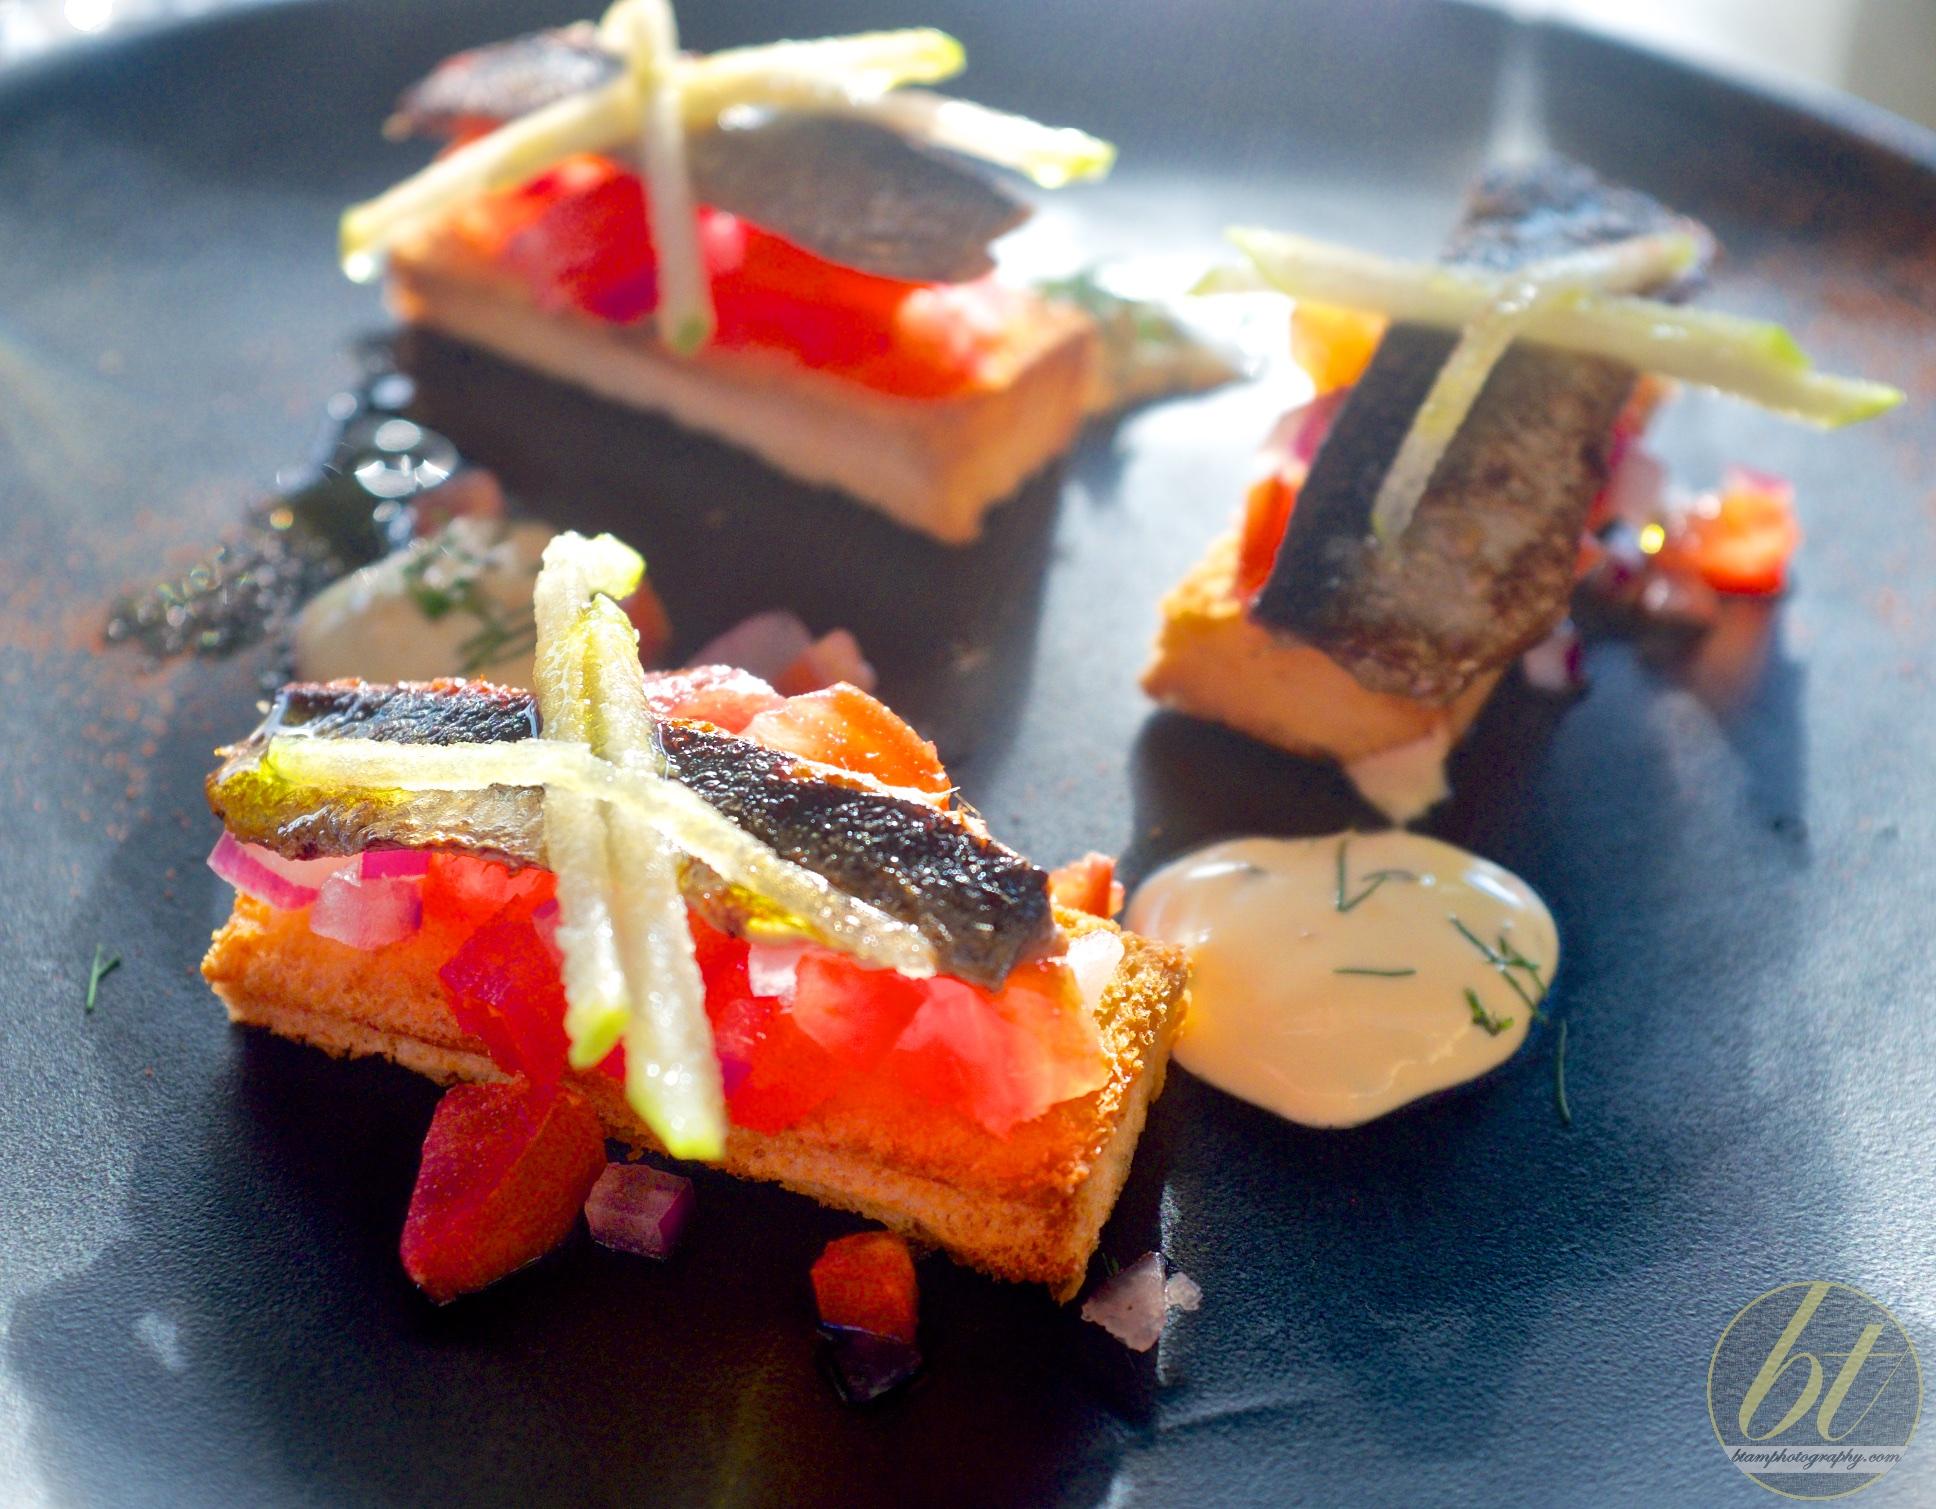 Sardines with toasted brioche, tomato salsa, and horseradish mayo ($21)